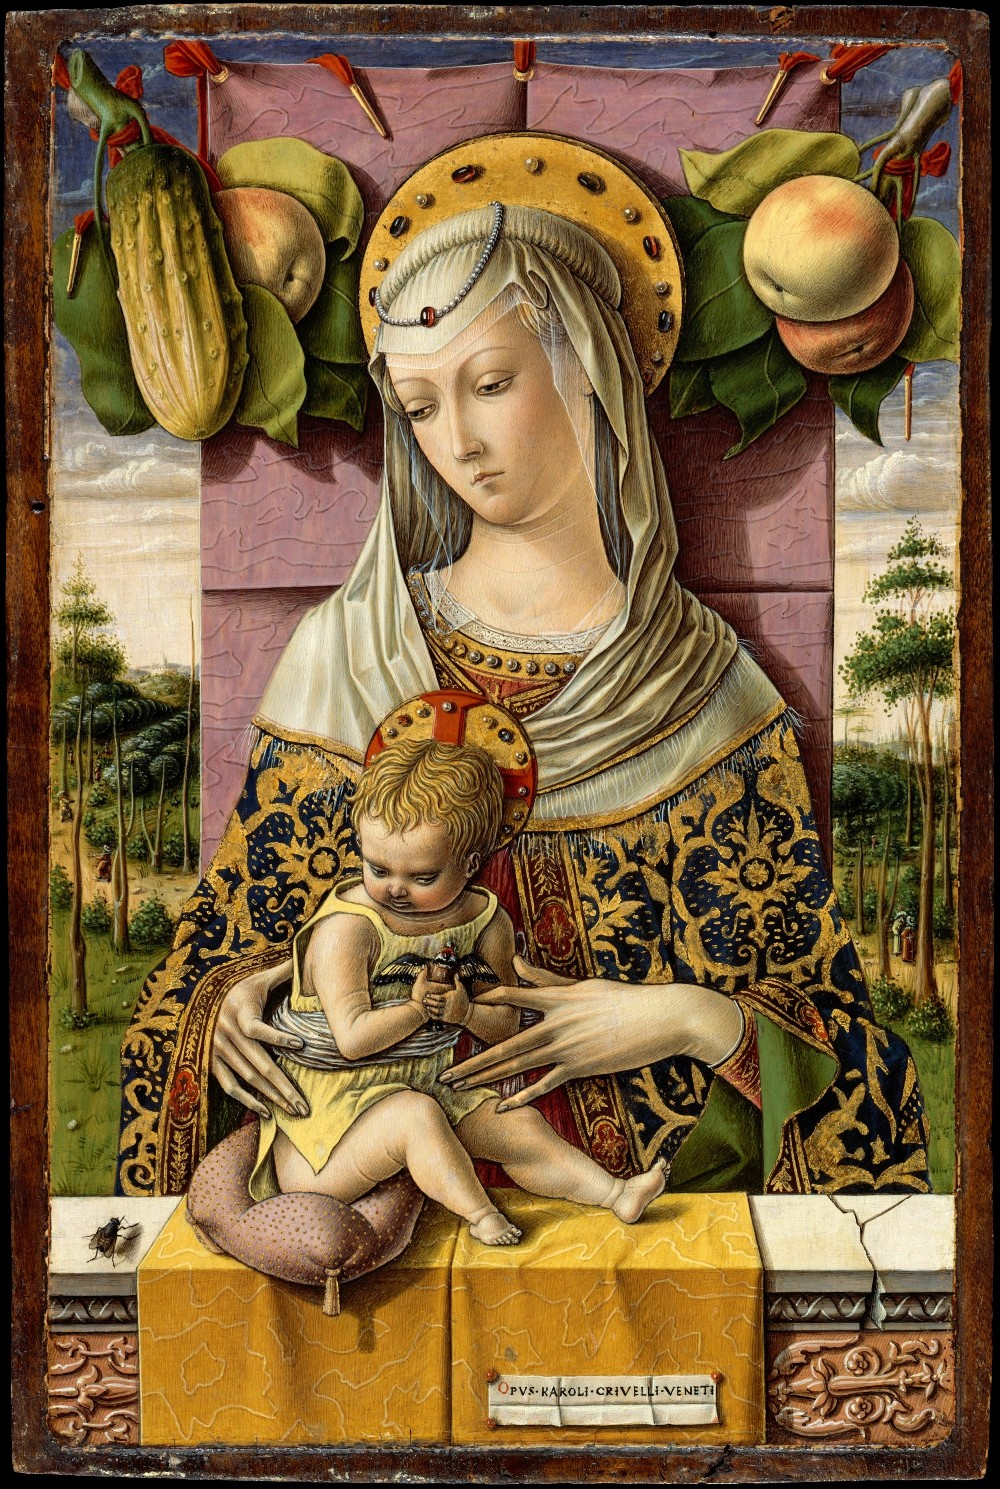 Карло Кривелли Мадонна с младенцем мал.jpg